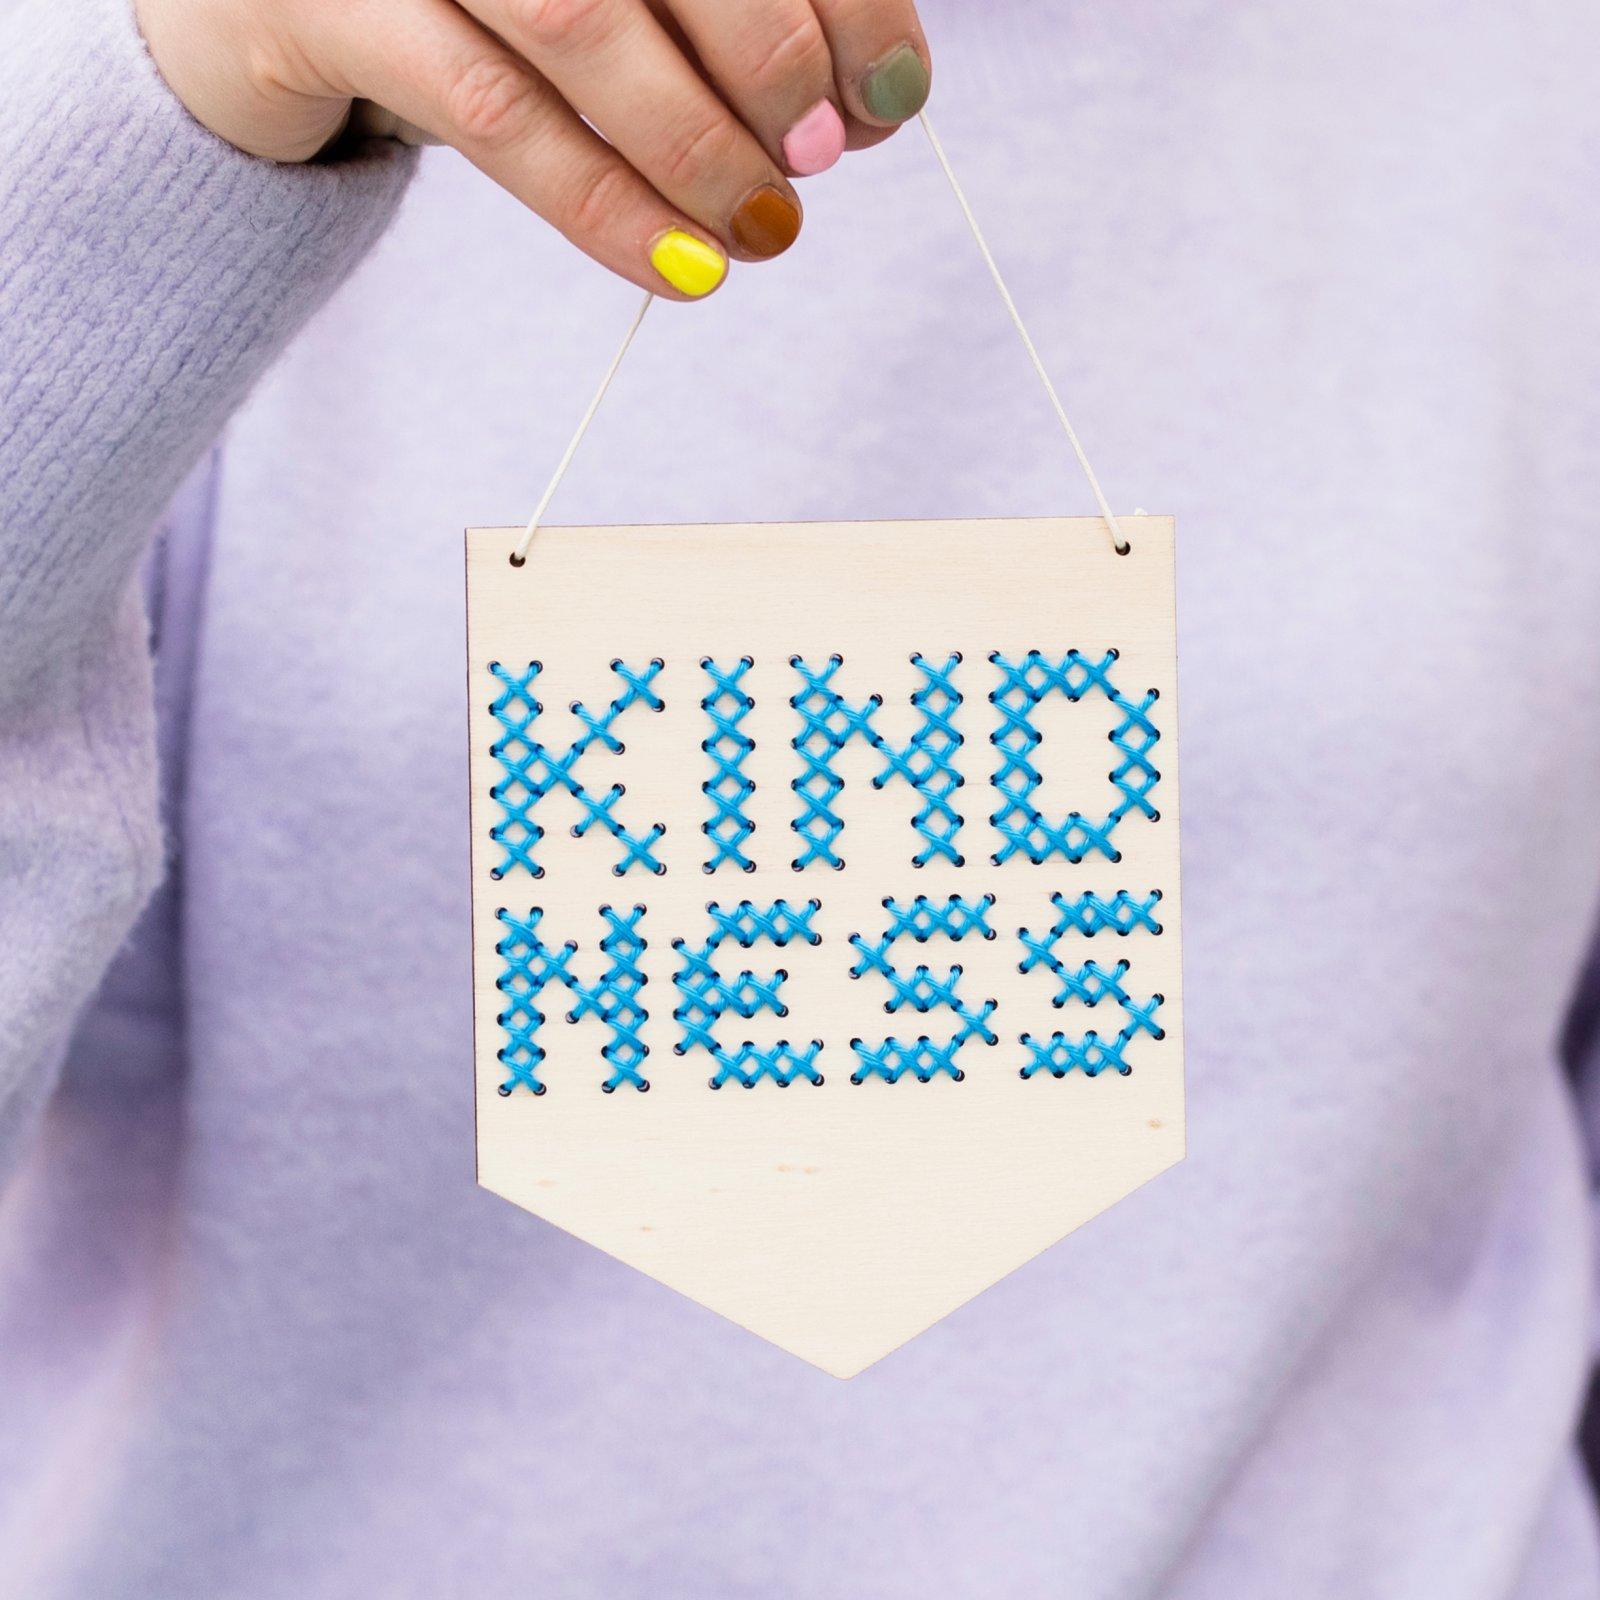 Kindness Cross Stitch Banner Kit